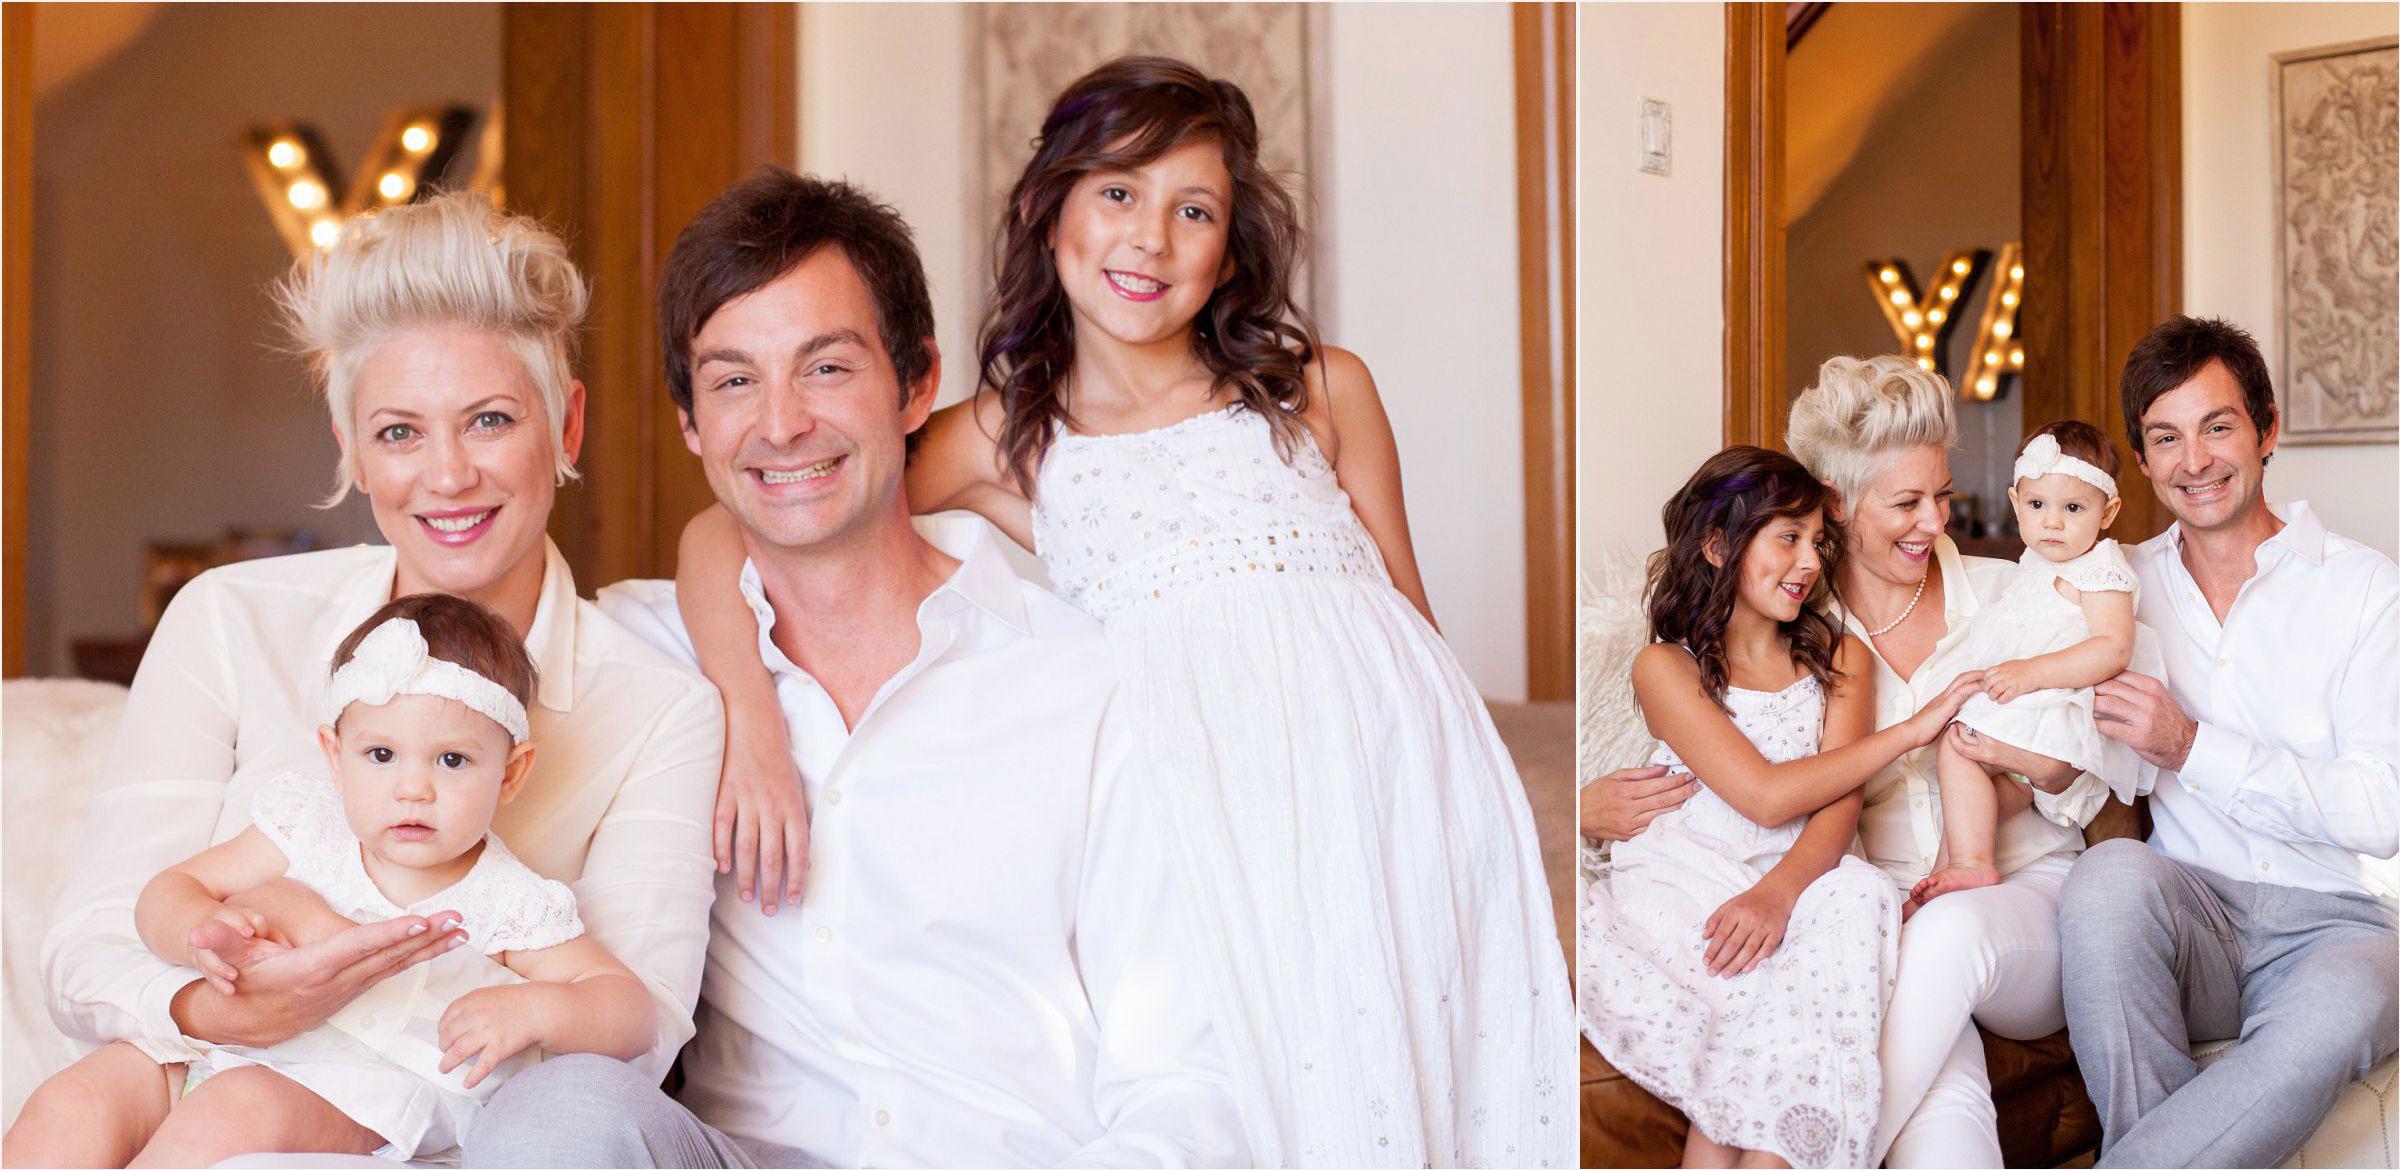 Family-lifestyle-portrait-session.jpg